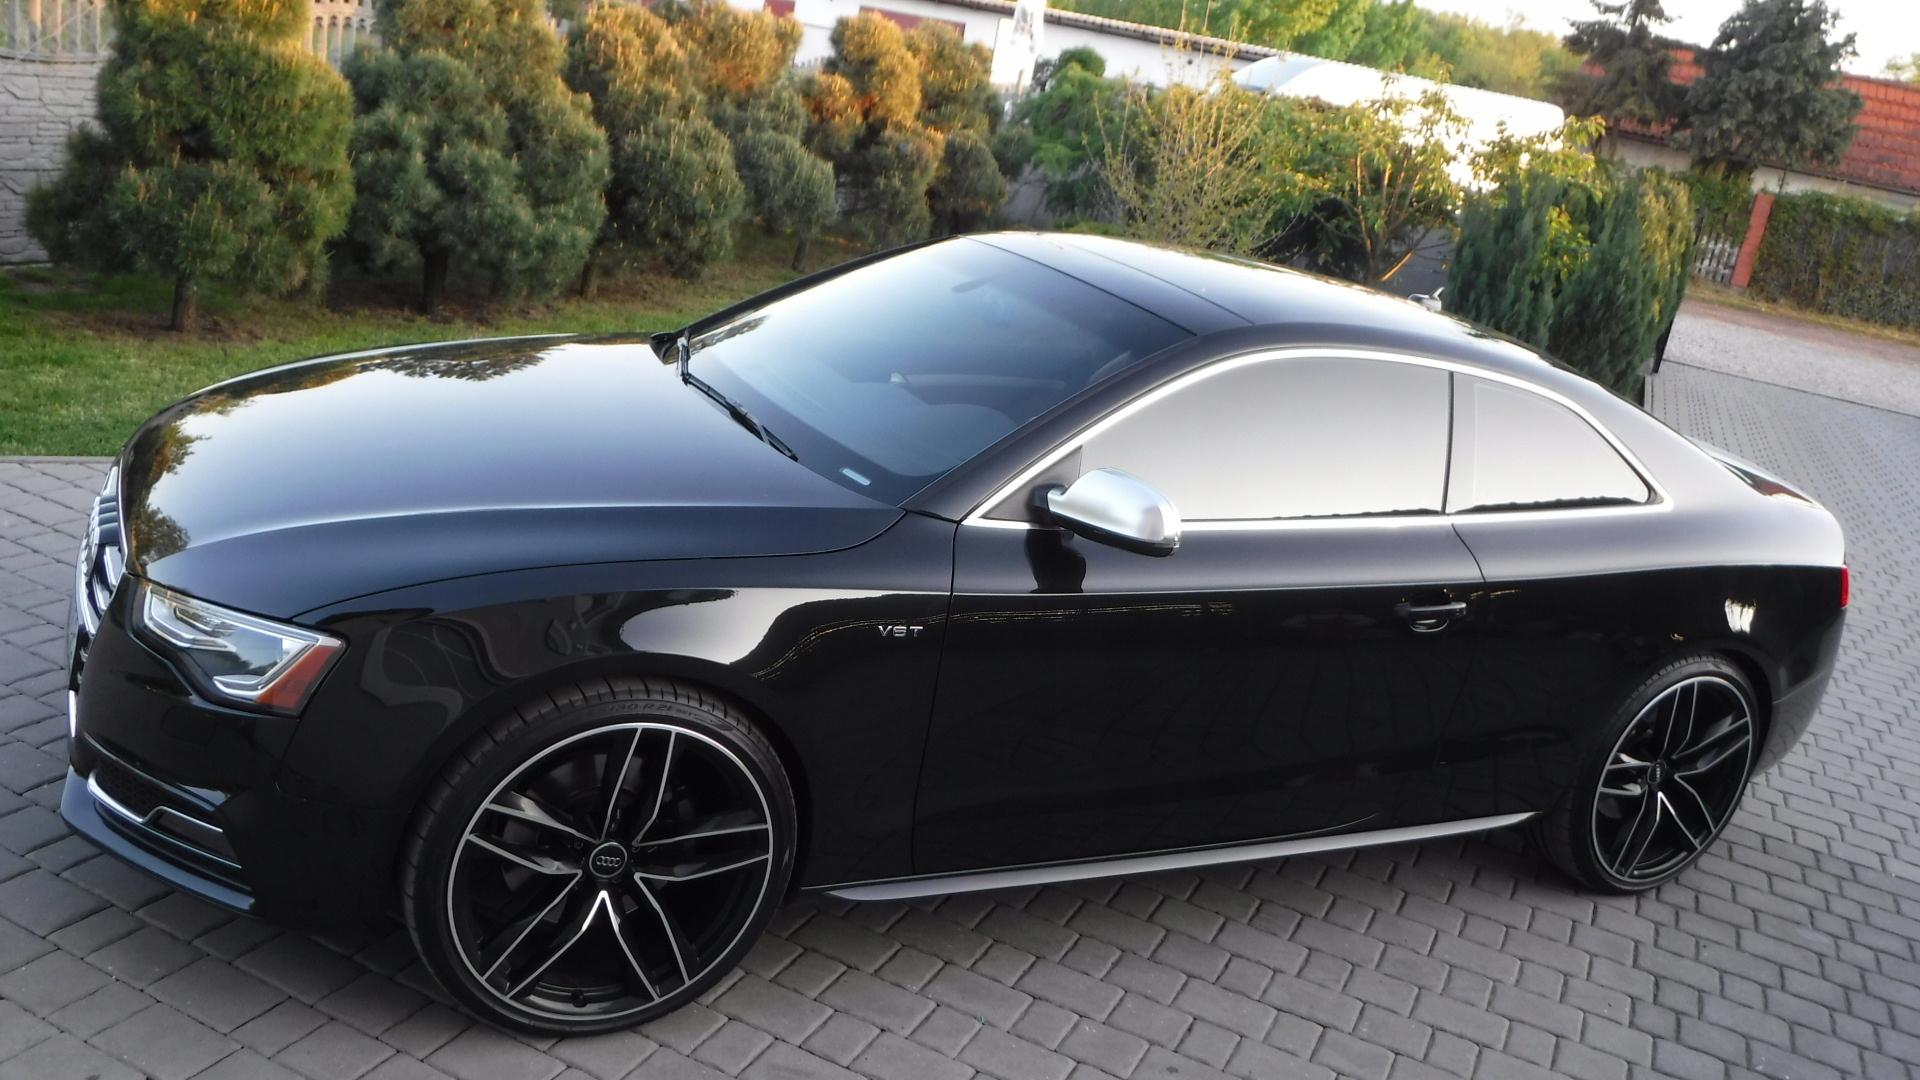 Rims Wheels 21 Audi Rs6 Rs7 A5 A6 S5 A7 A8 Q5 5x112 Xdalys Lt